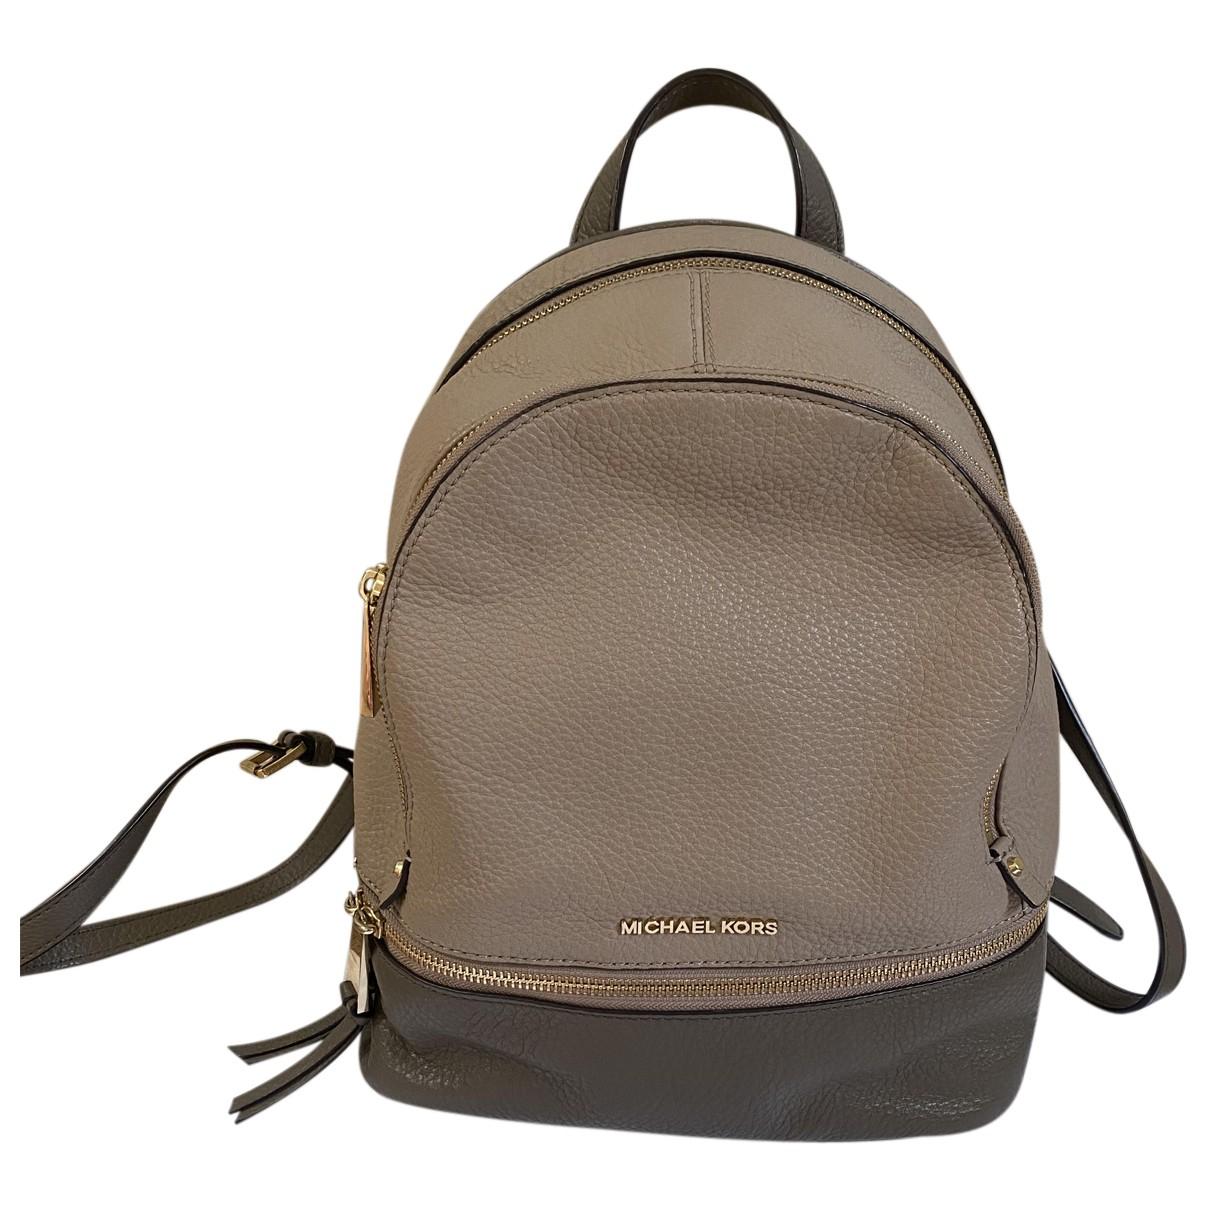 Michael Kors Rhea Brown Leather backpack for Women N